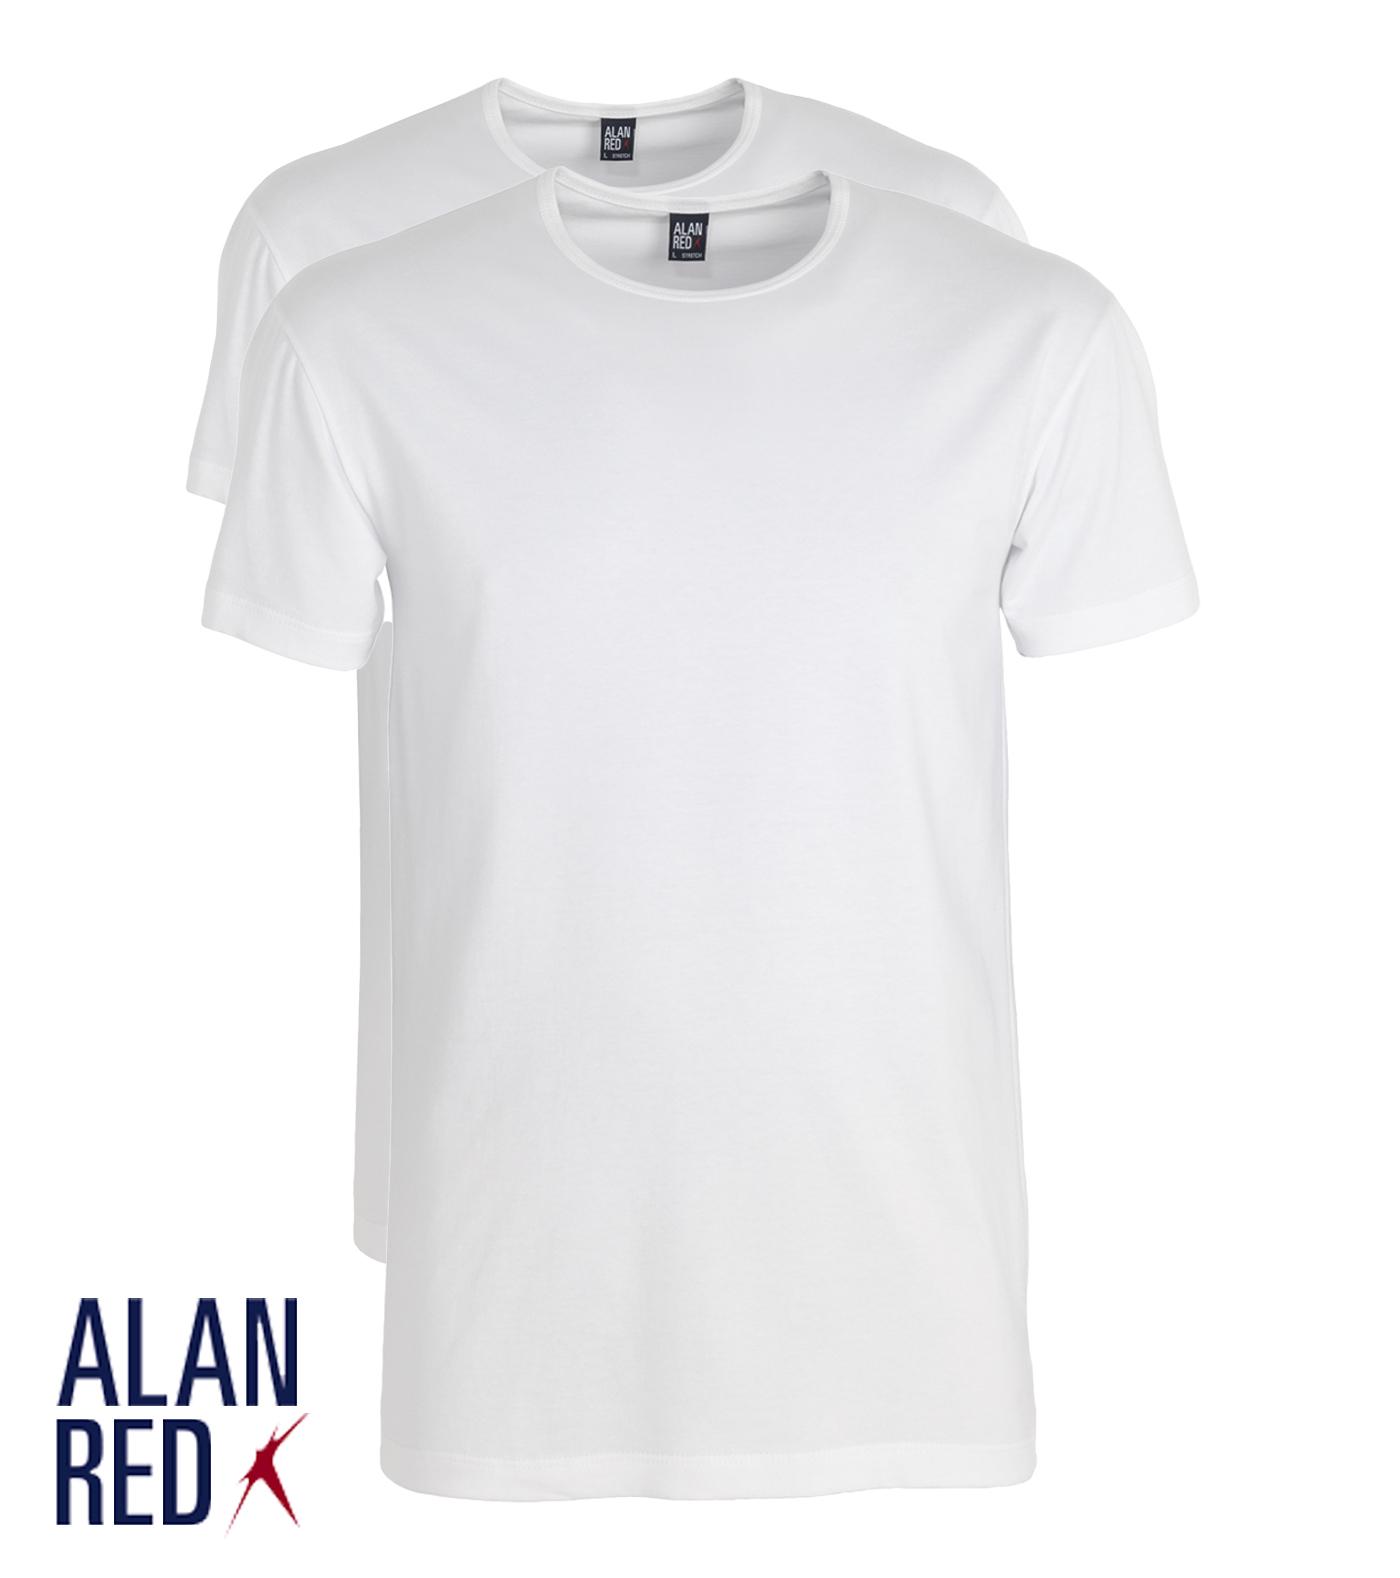 Alan Red - Ottawa stretch - wit 2-pack